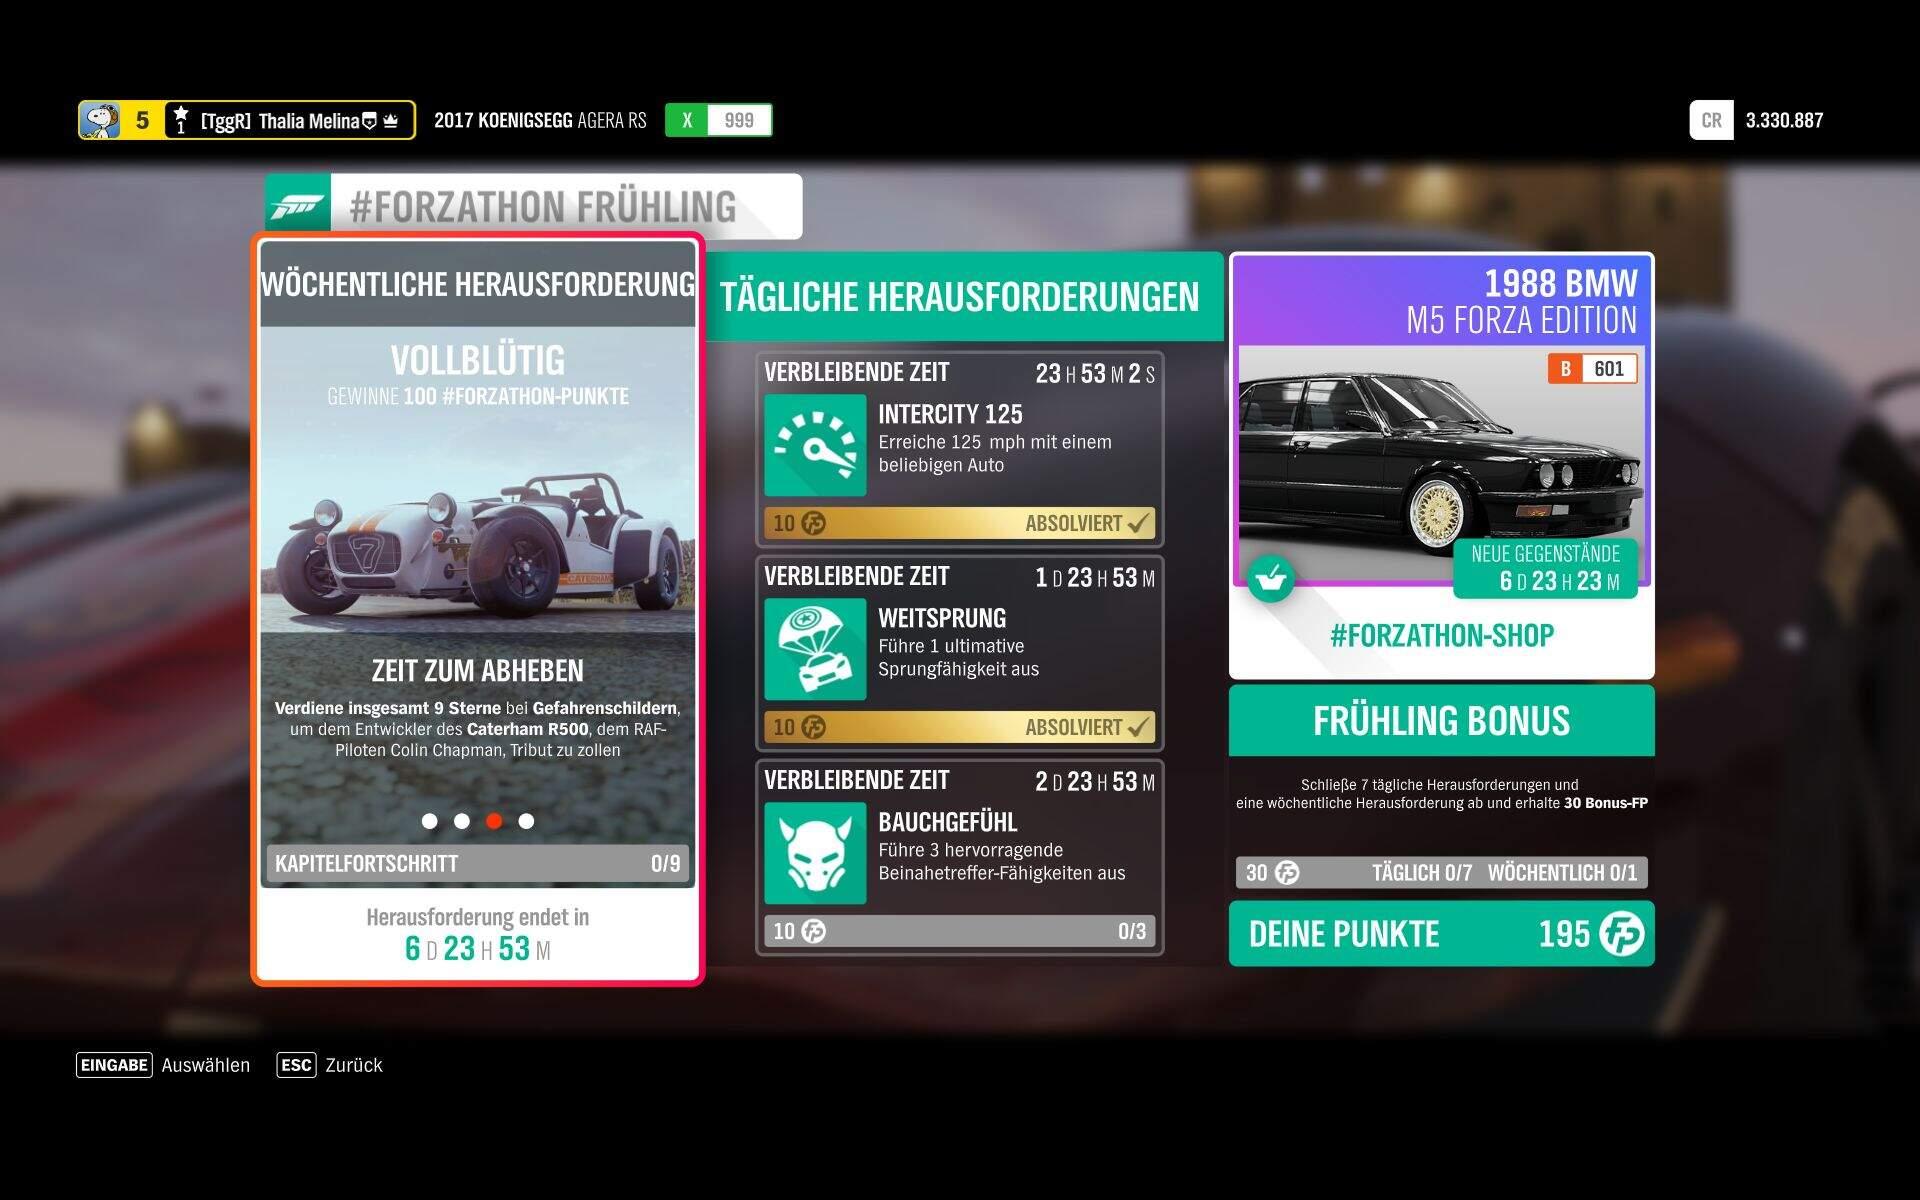 Forza Horizon 4 #Forzathon KW 46 – Vollblütig Aufgabe 3